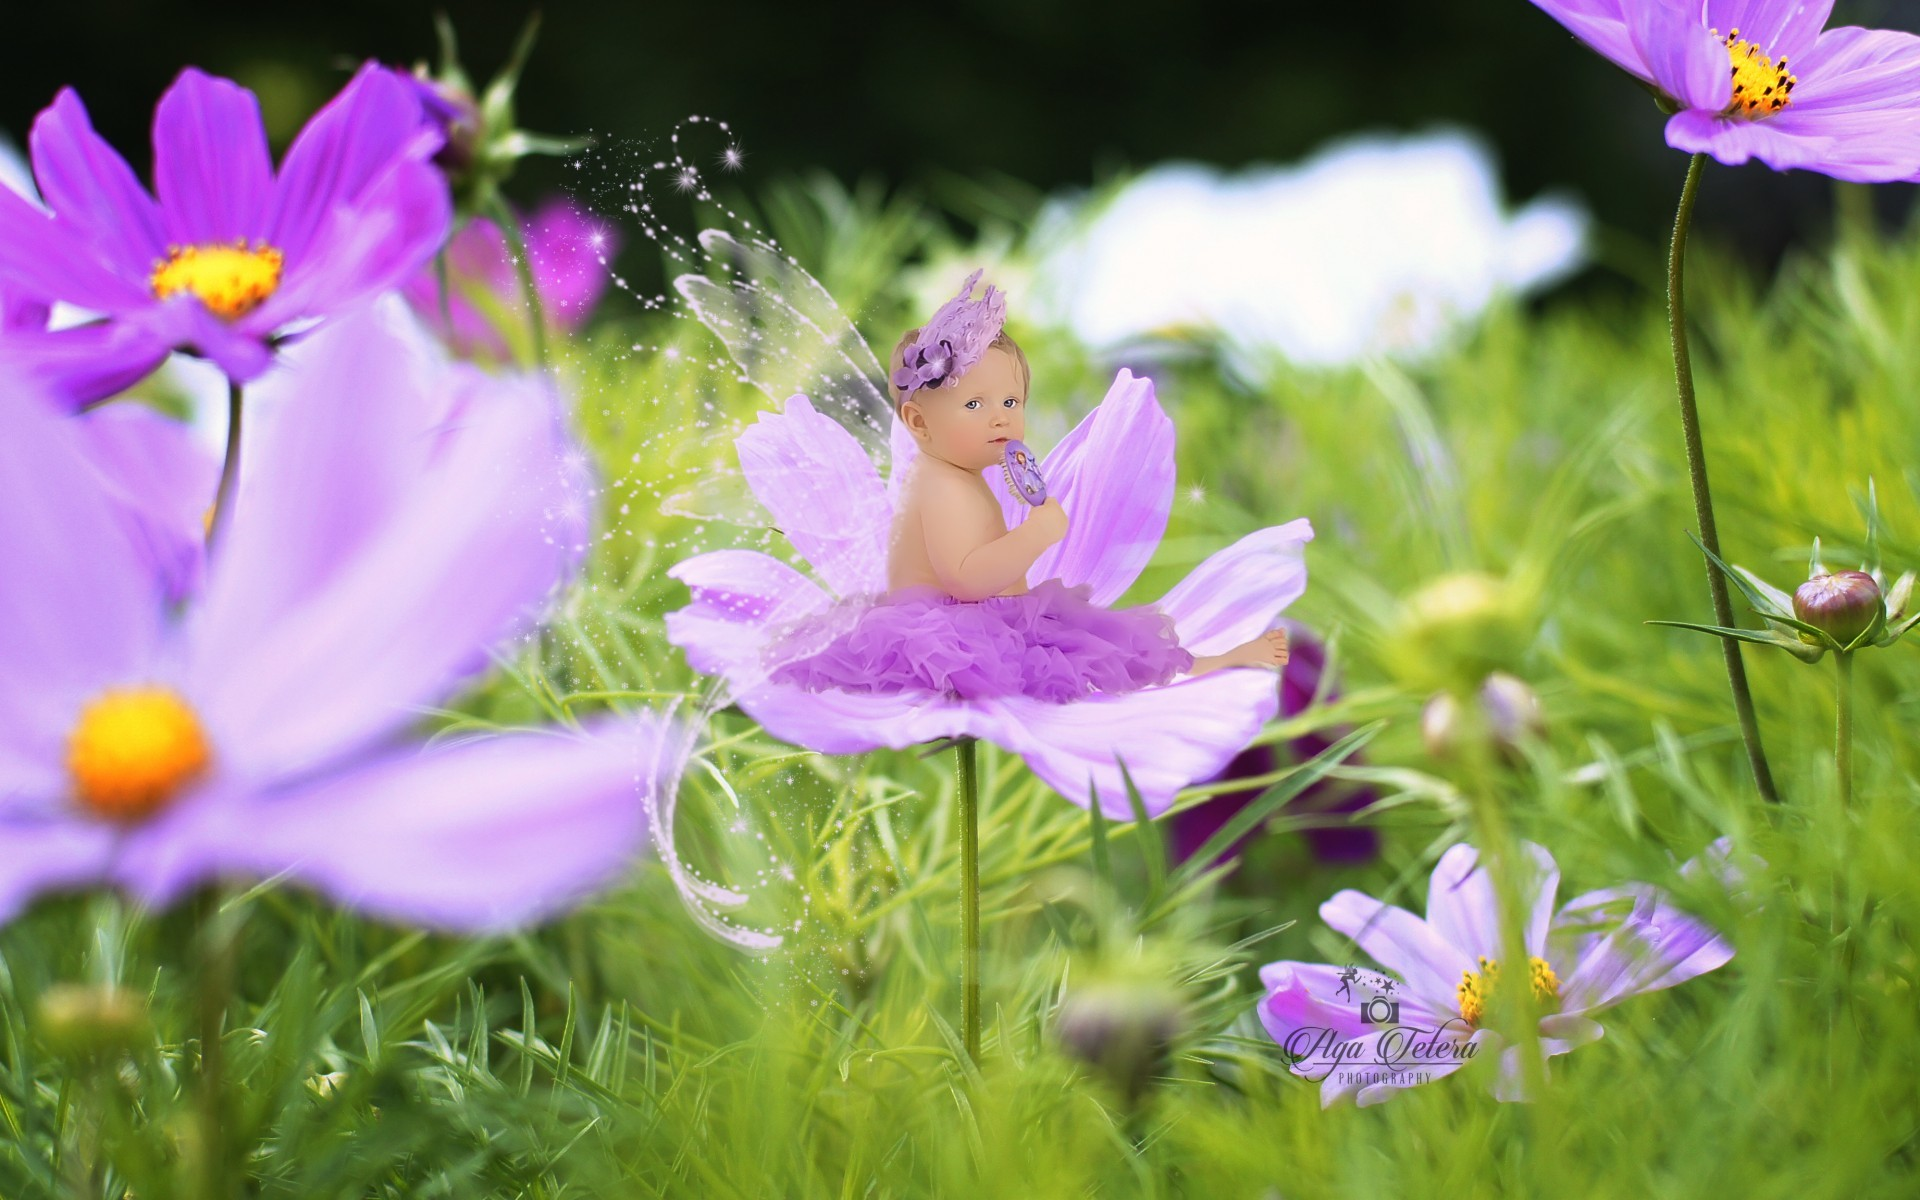 Cute / Cute baby girl Wallpaper